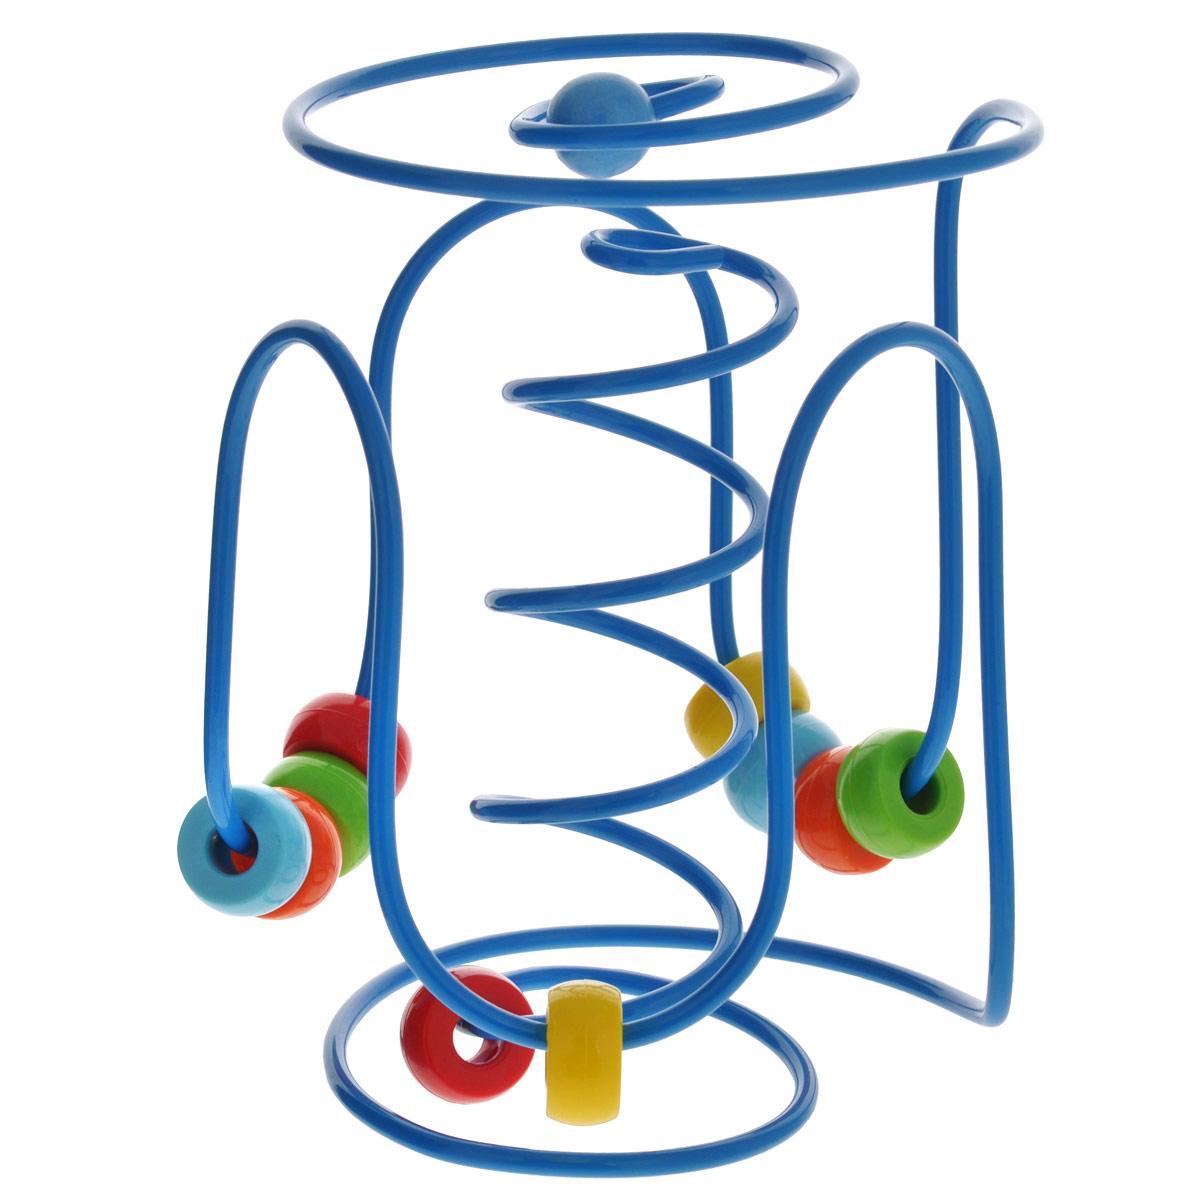 "Развивающая игрушка Hape ""Лабиринт"". Е1800"